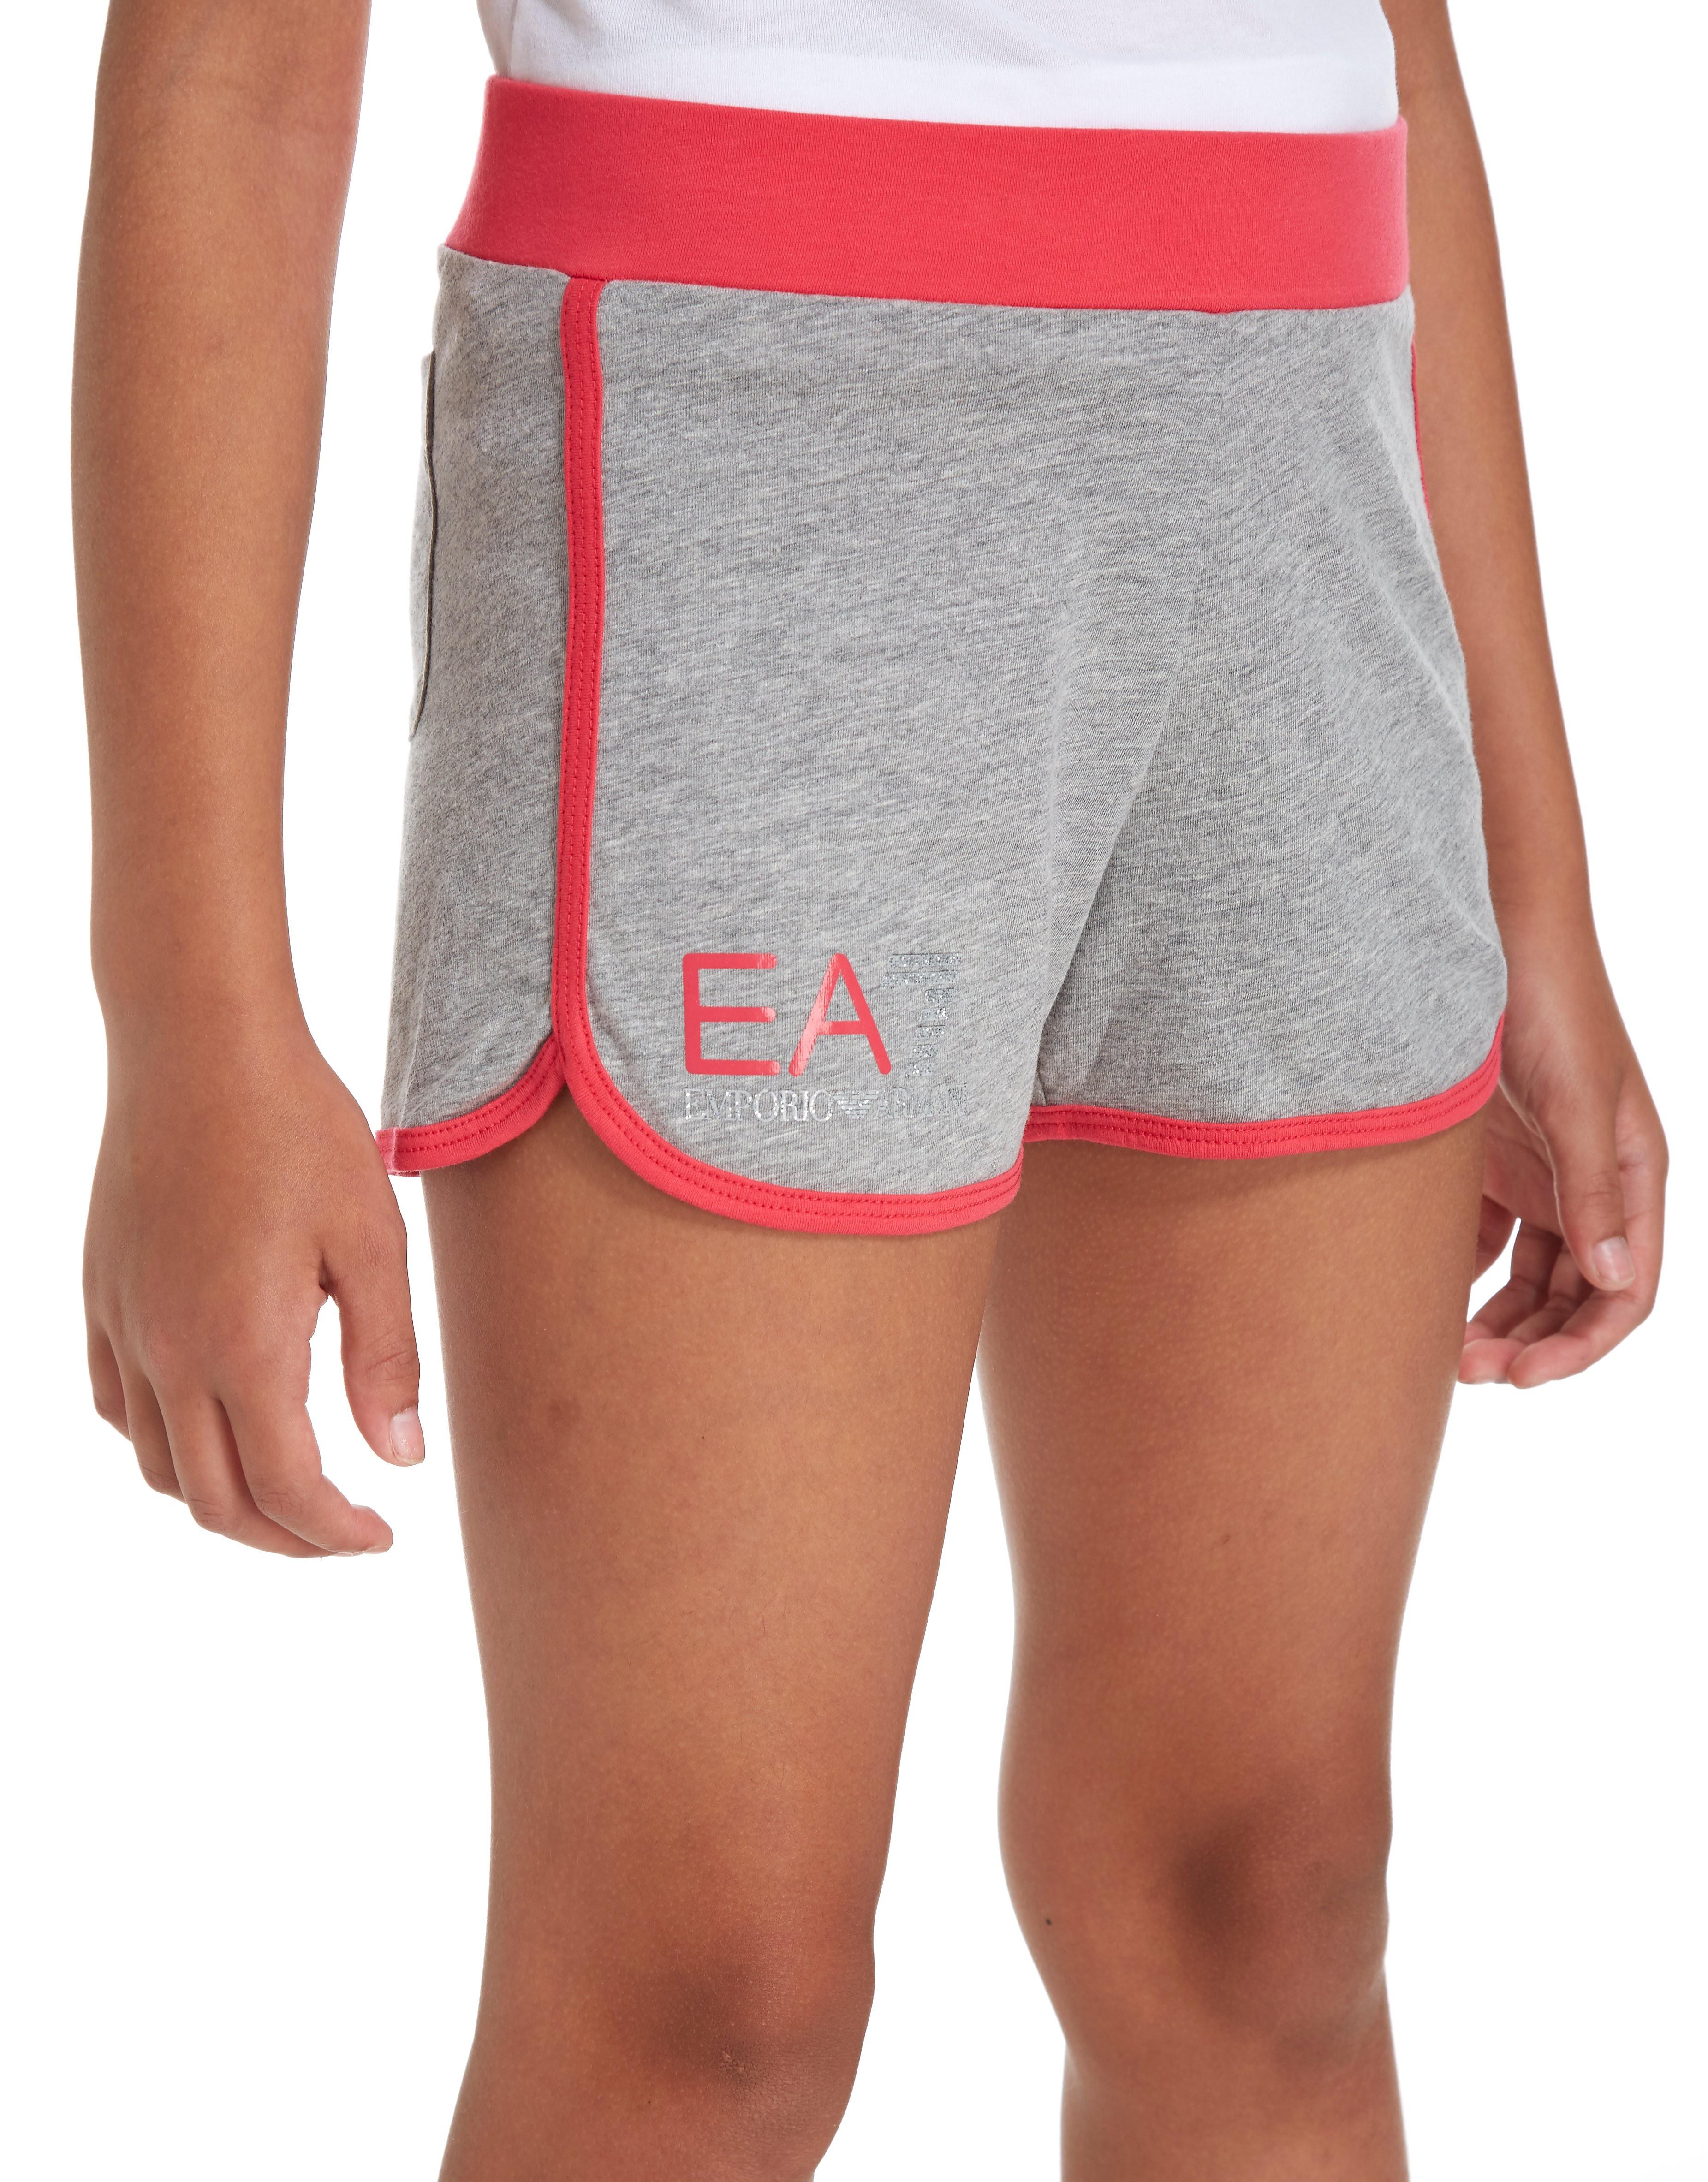 Emporio Armani EA7 Girls' Fleece Shorts Junior